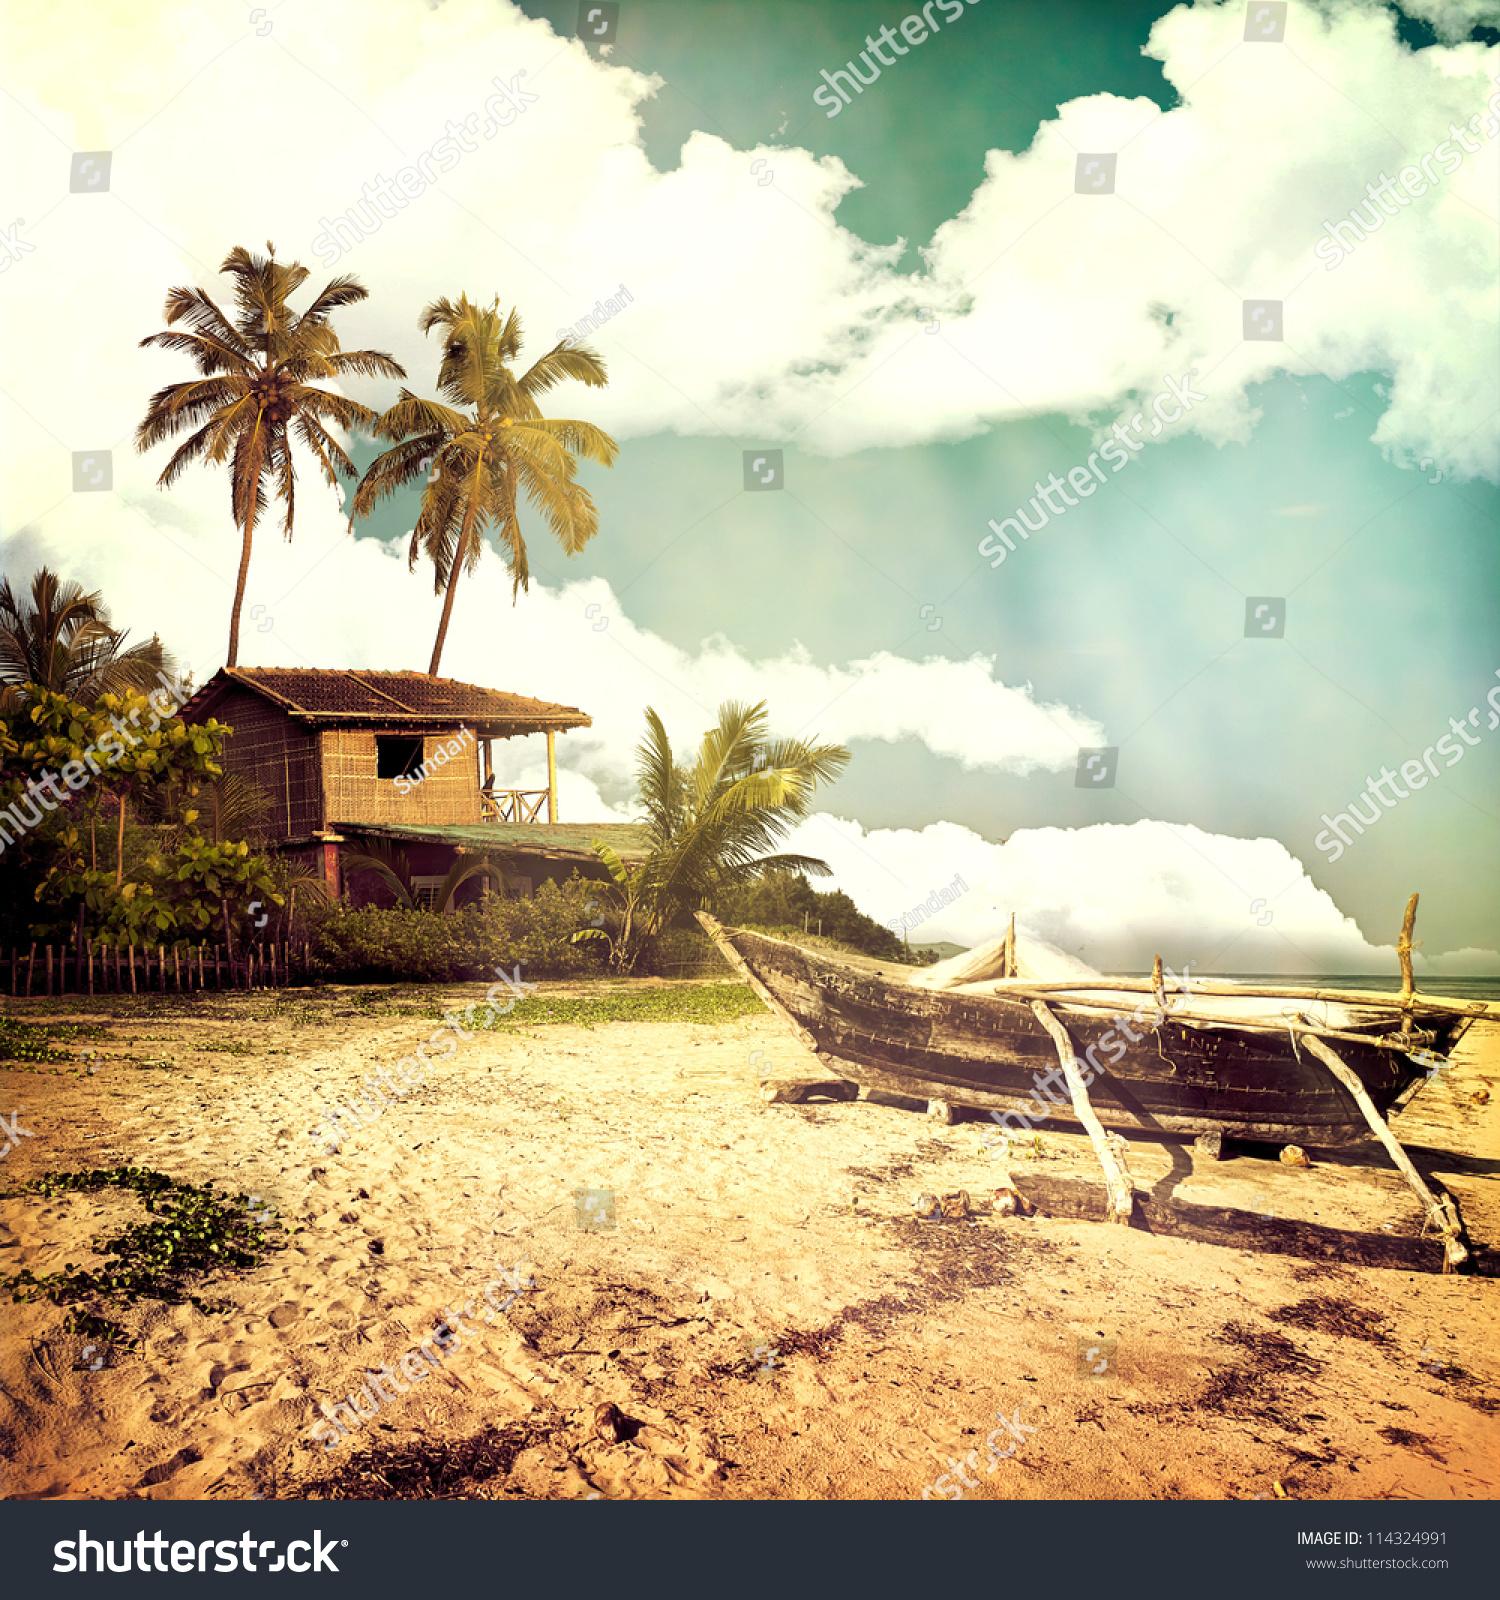 Vintage Beach Background Stock Photo 114324991 : Shutterstock